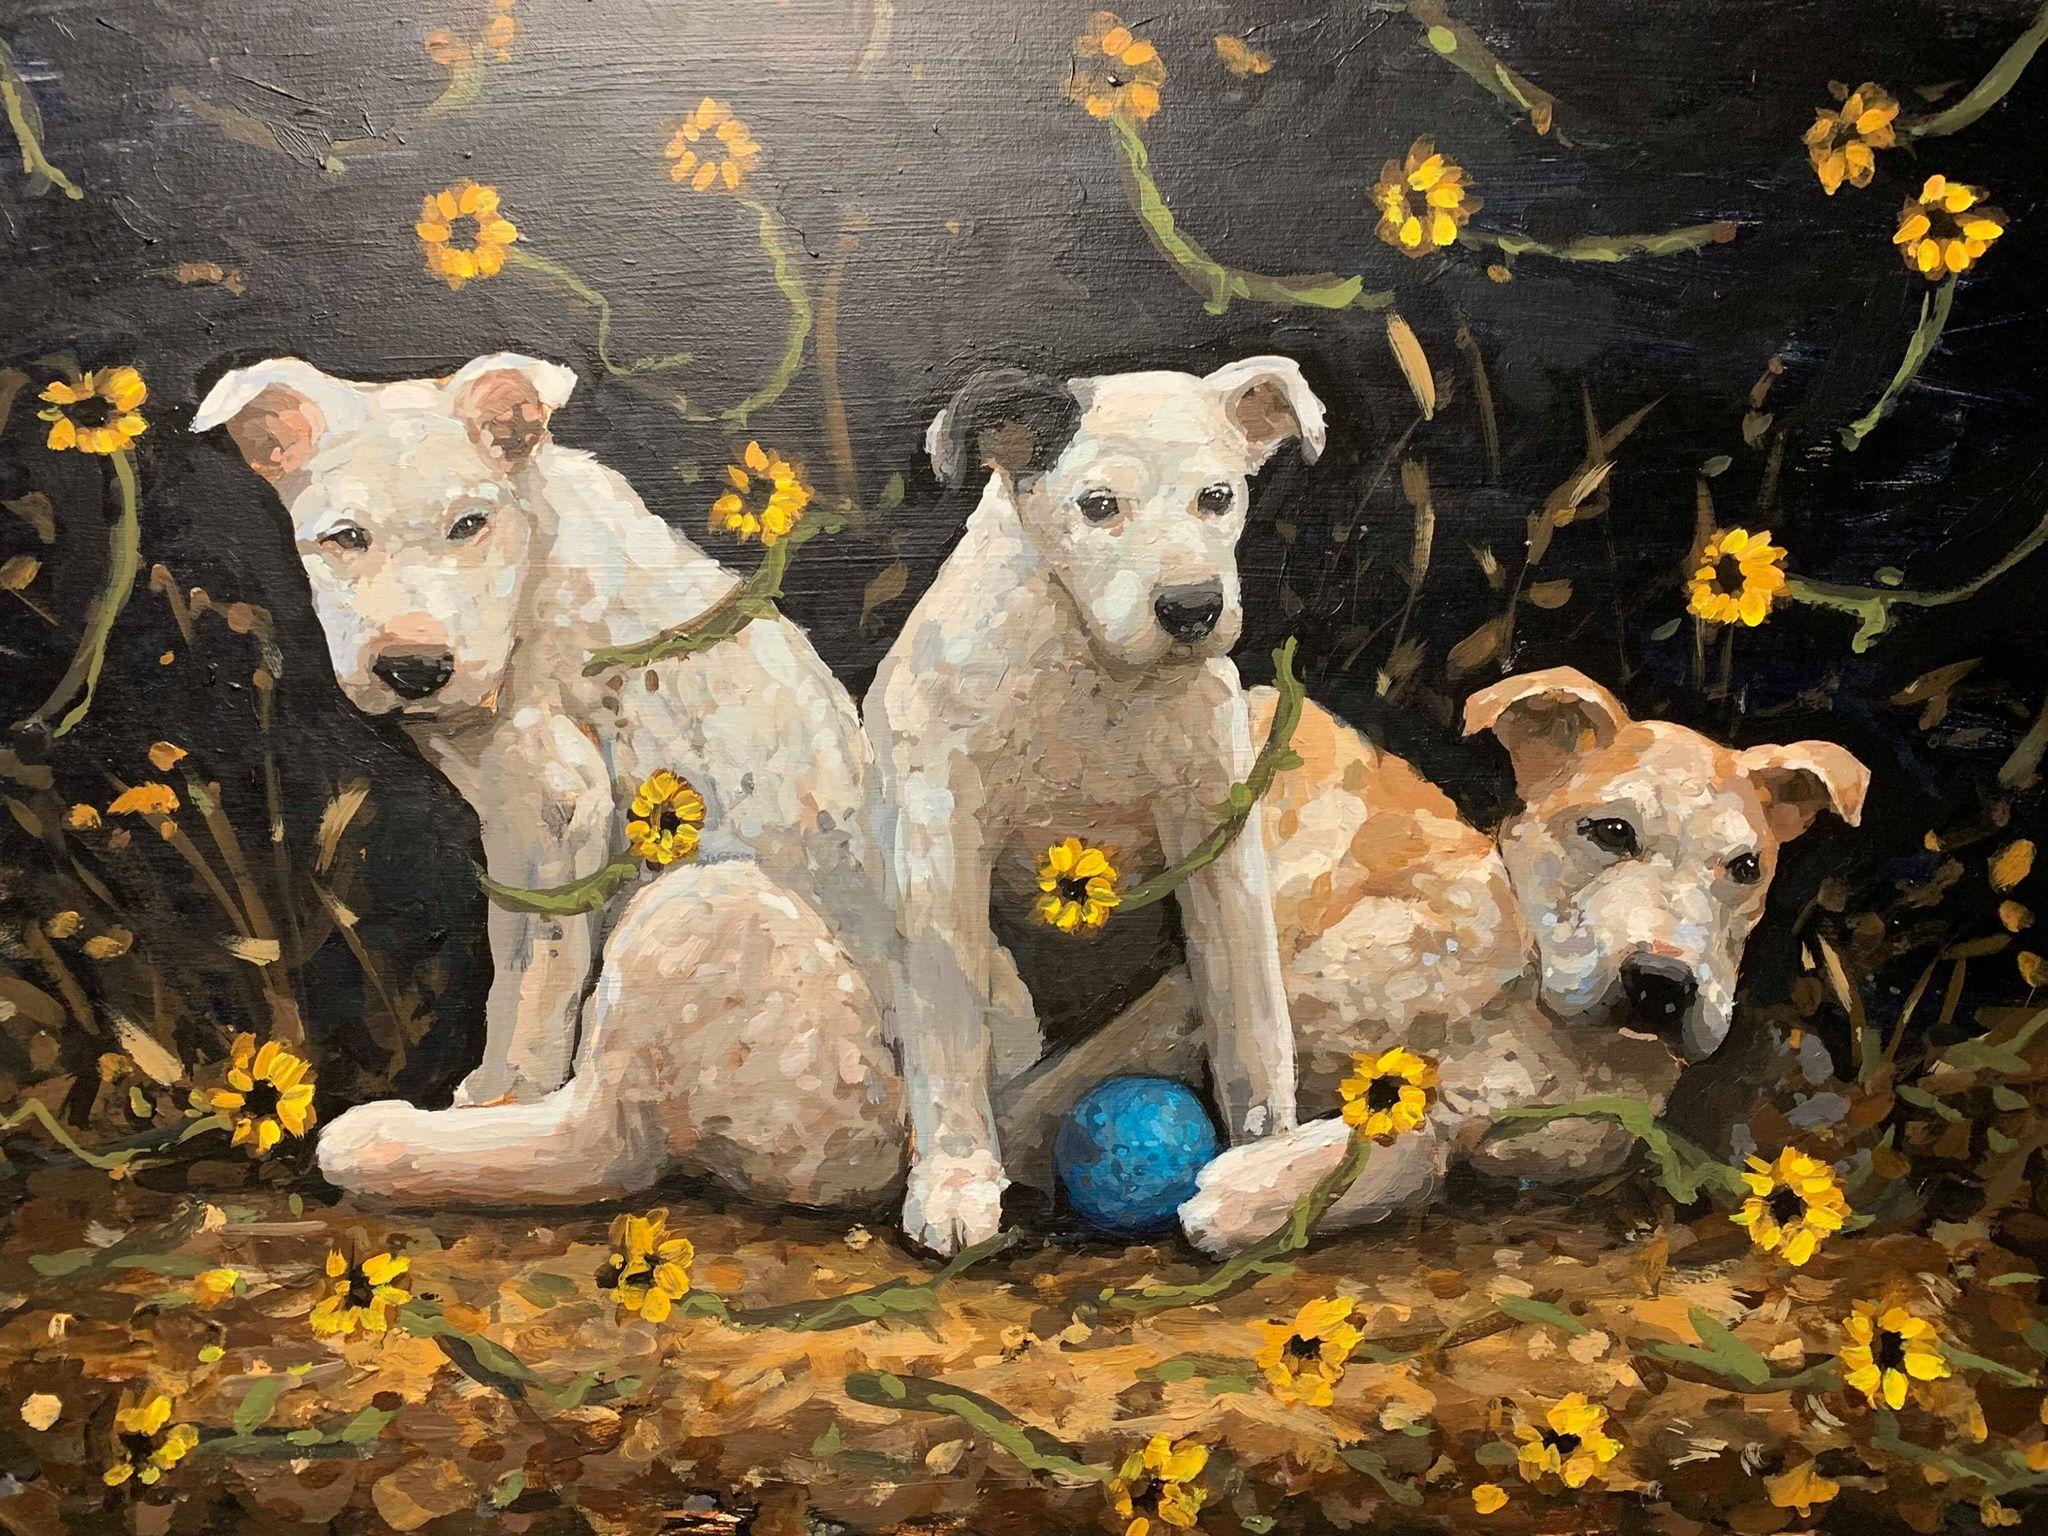 3 Rez Dogs with a Handball, 2019